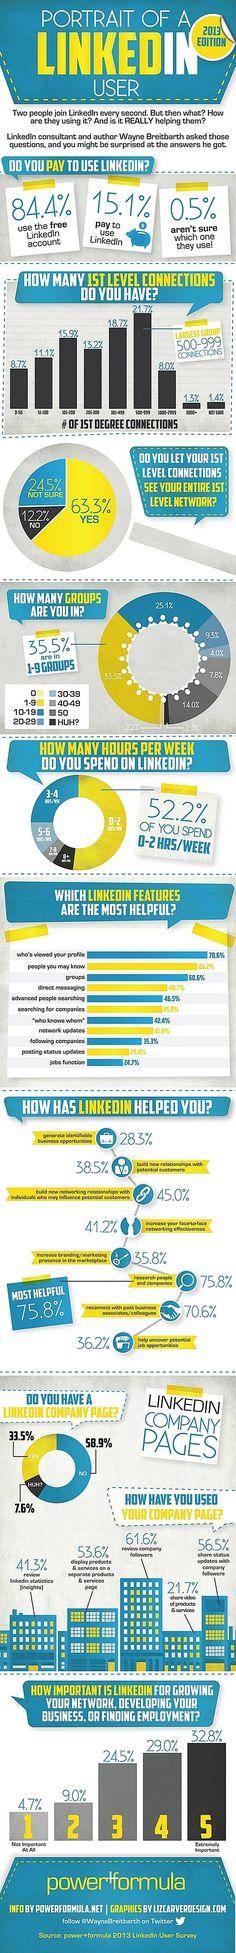 How Do People Really Use #LinkedIn #Infographic via @Viveka von Rosen